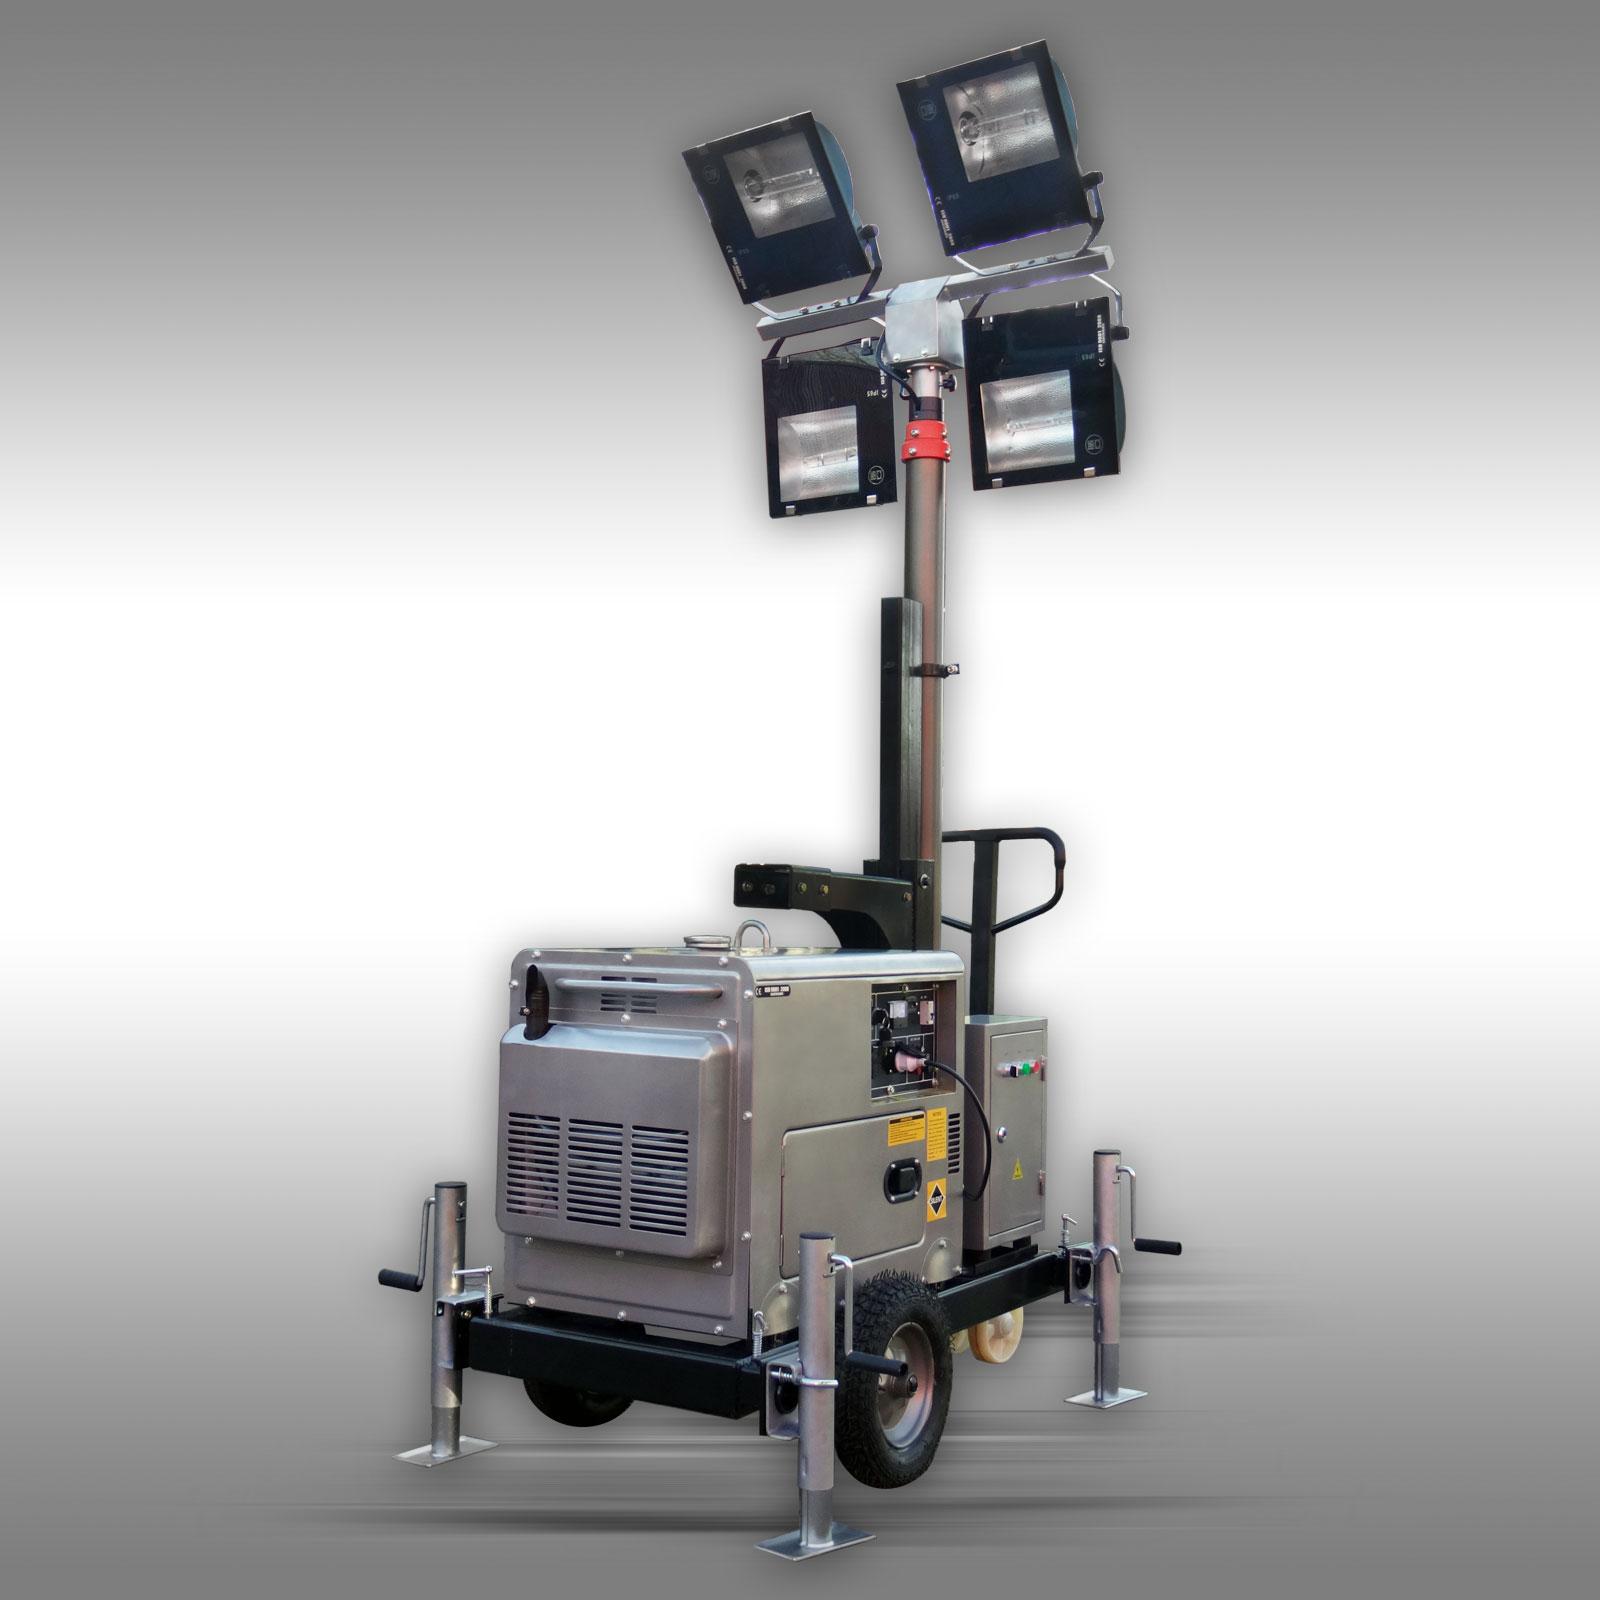 diesel stromgenerator 5 kw lichtmast flutlicht stromaggregat stromerzeuger ebay. Black Bedroom Furniture Sets. Home Design Ideas